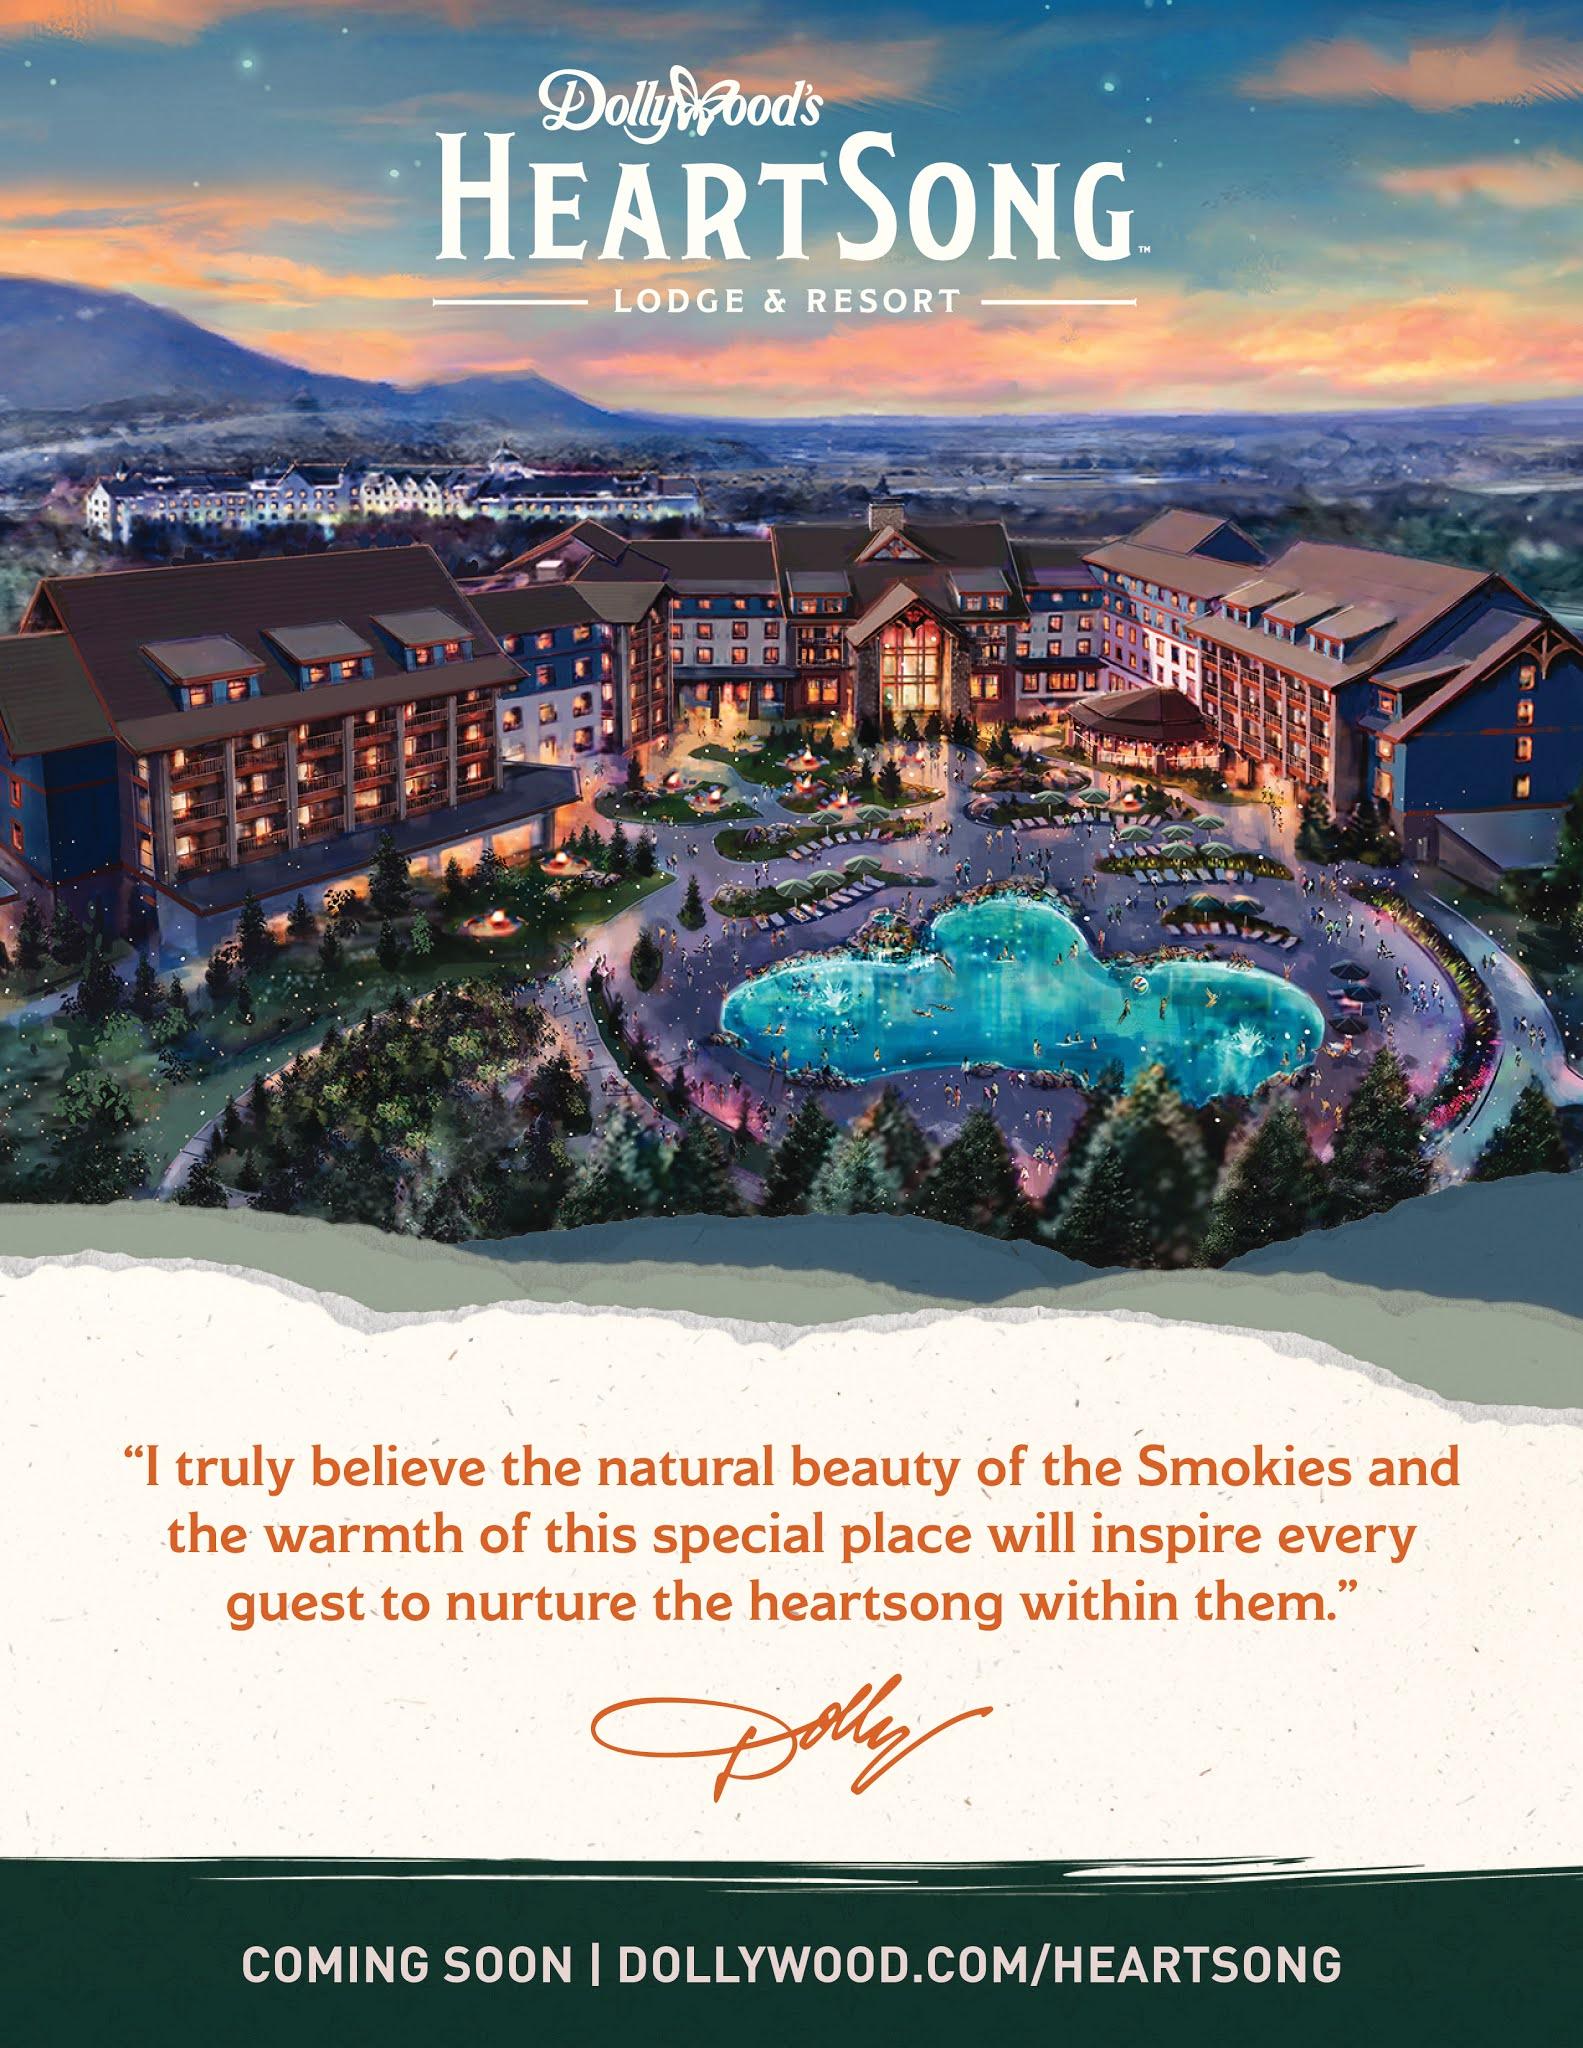 Dollywood Announces New Resort Property, Half-Billion Dollar Investment Strategy